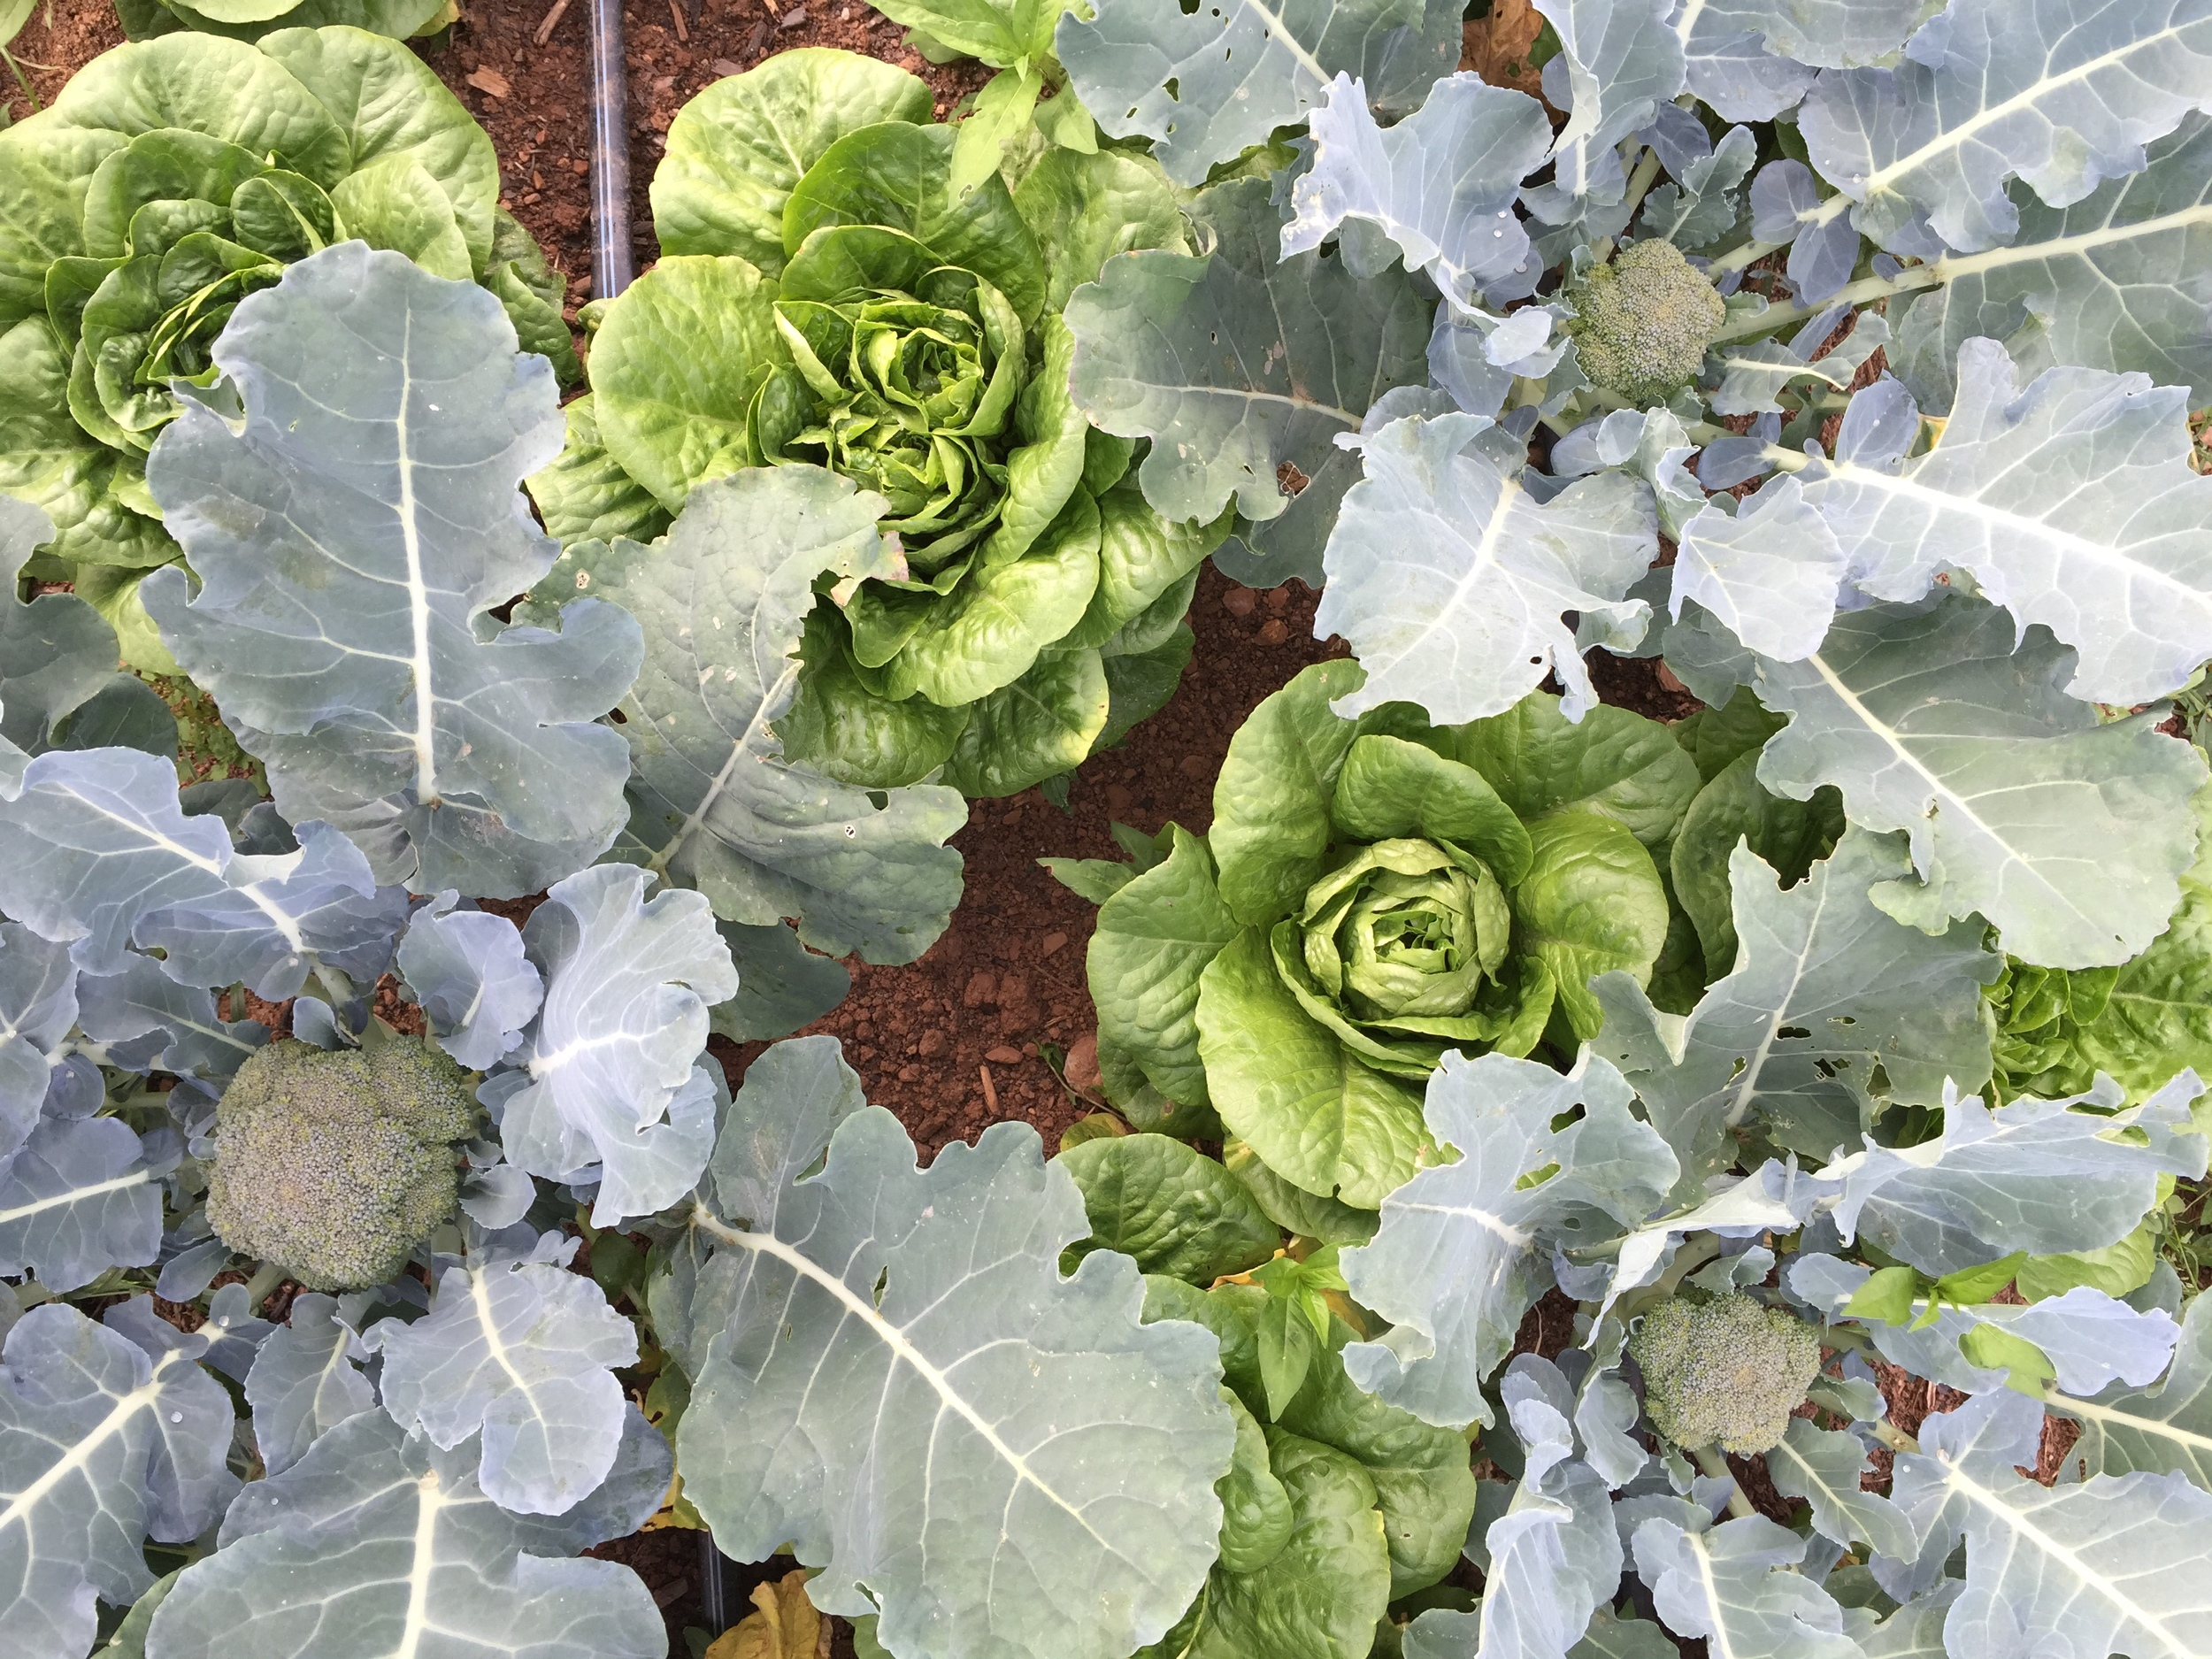 Broccoliinterplanted